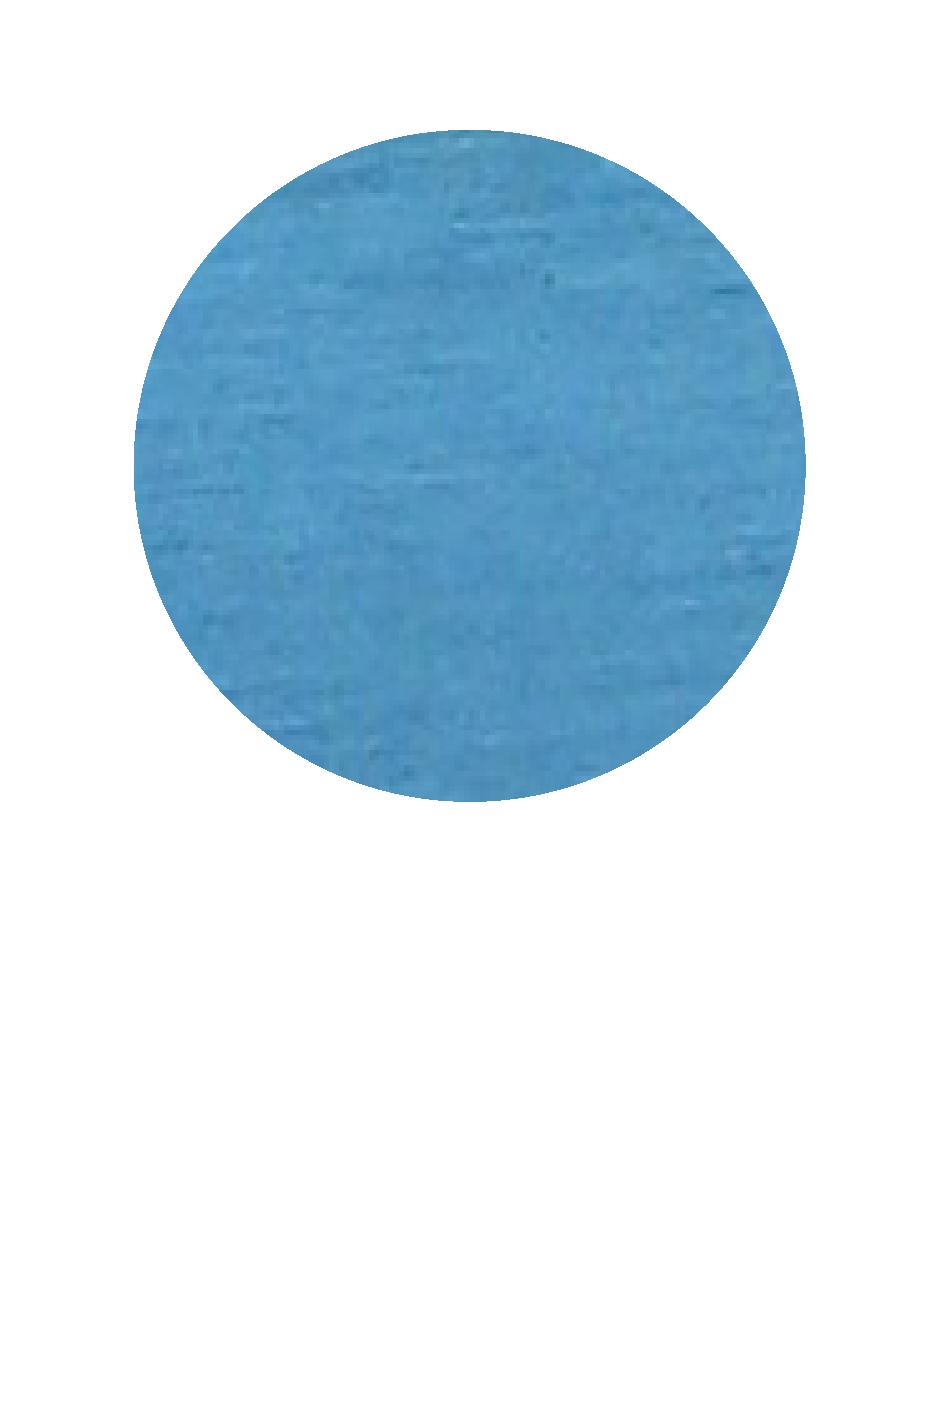 Copy of SKY BLUE